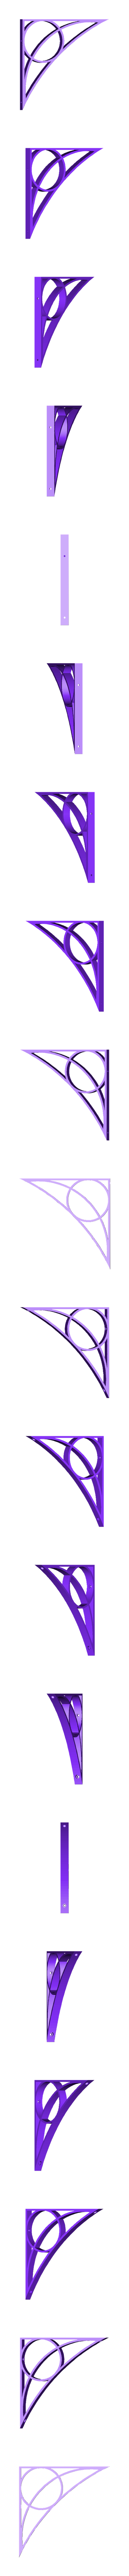 shelf_bracket.stl Download free STL file simple shelf bracket • 3D printer object, Thomllama